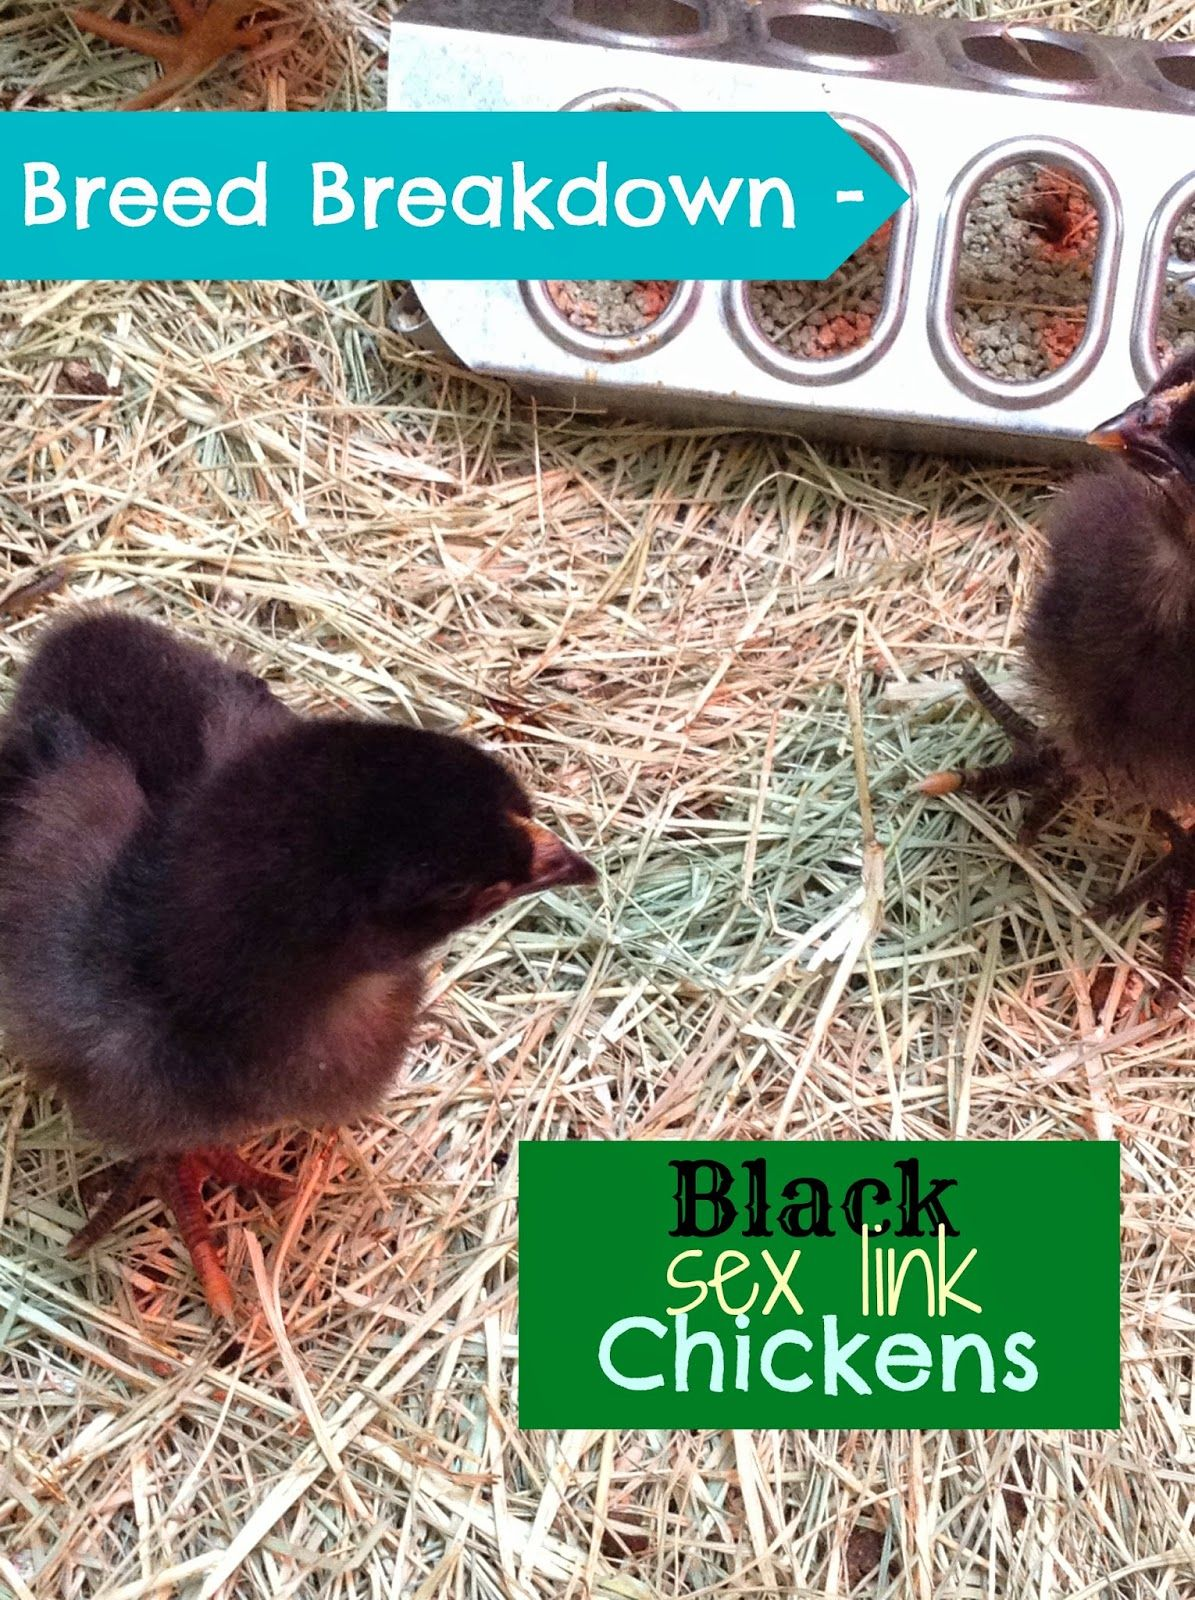 Black sex links chickens